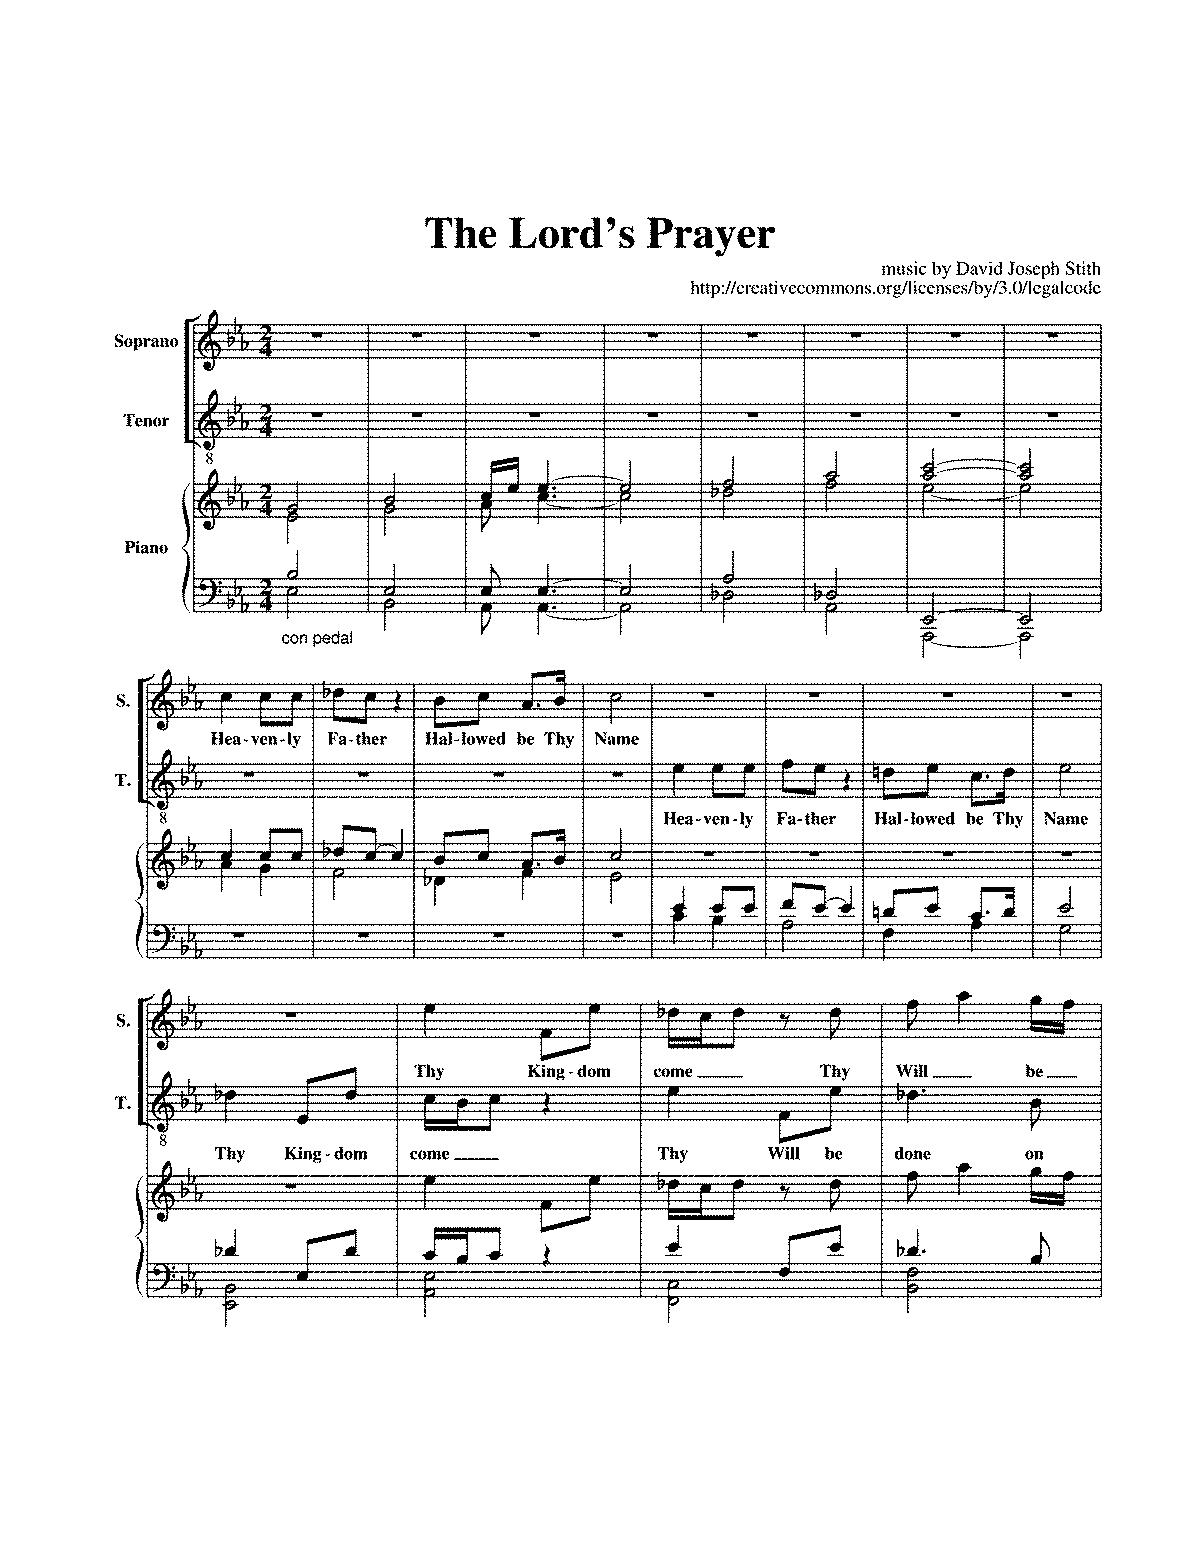 the lord u0027s prayer stith david joseph imslp petrucci music